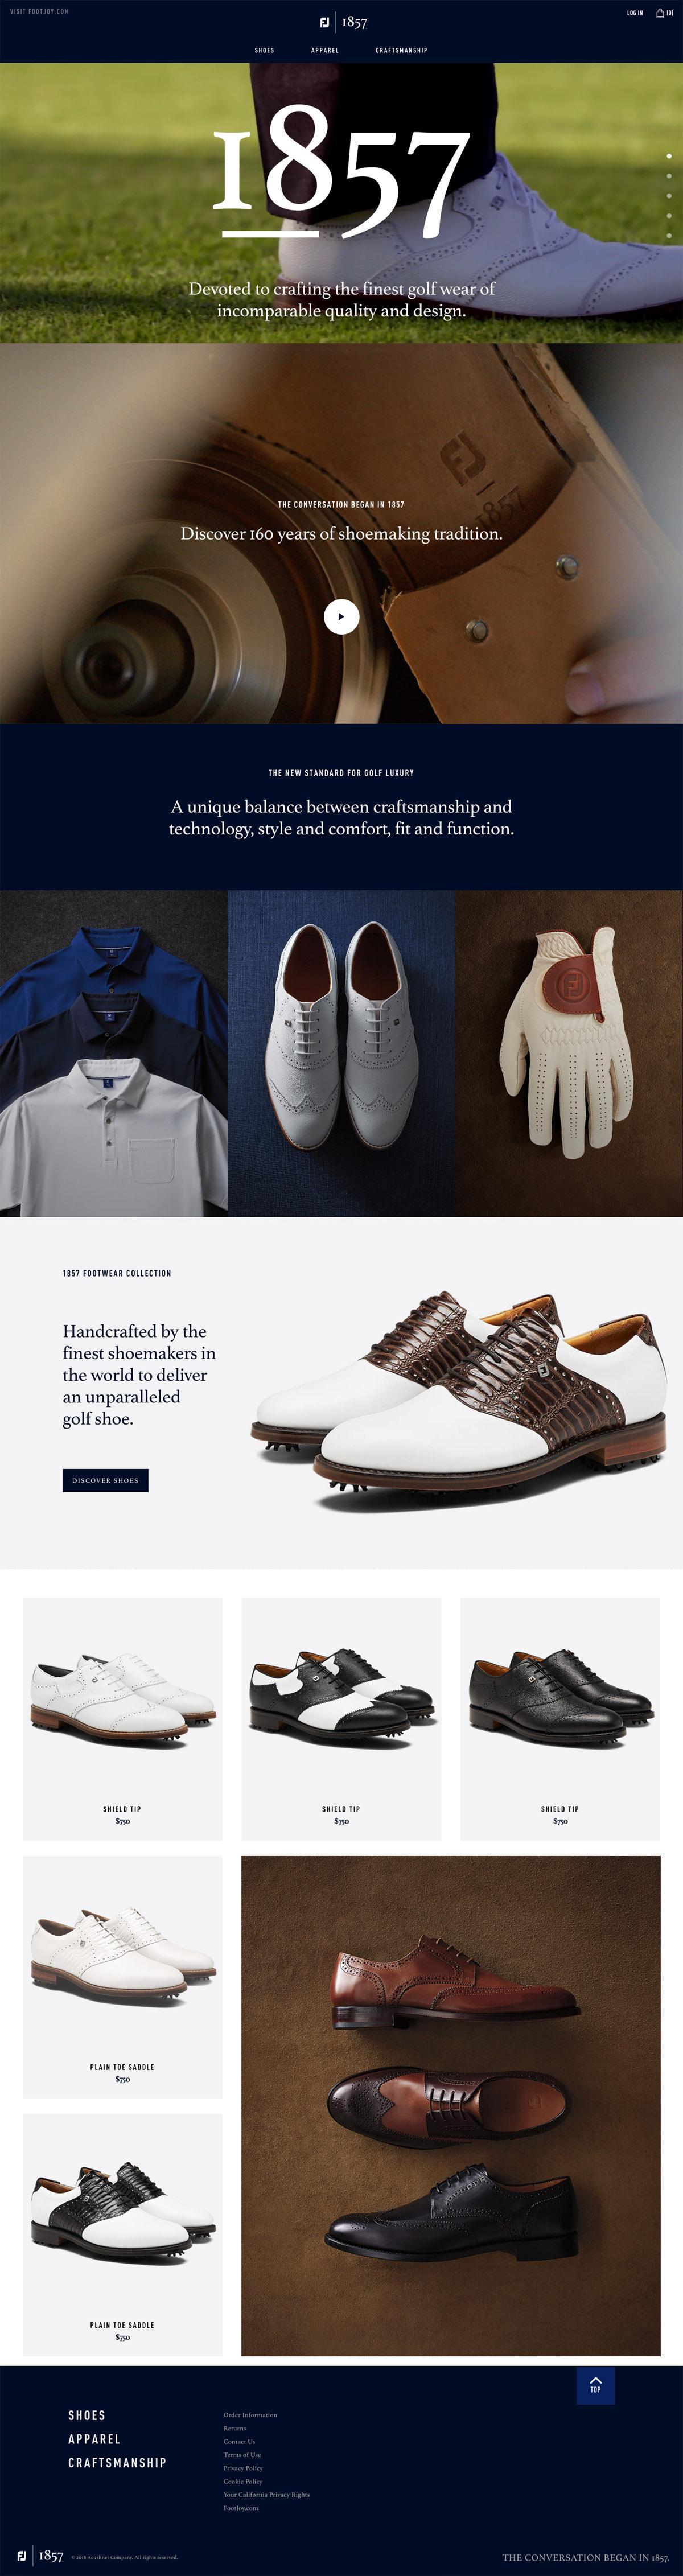 eCommerce website: FJ1857